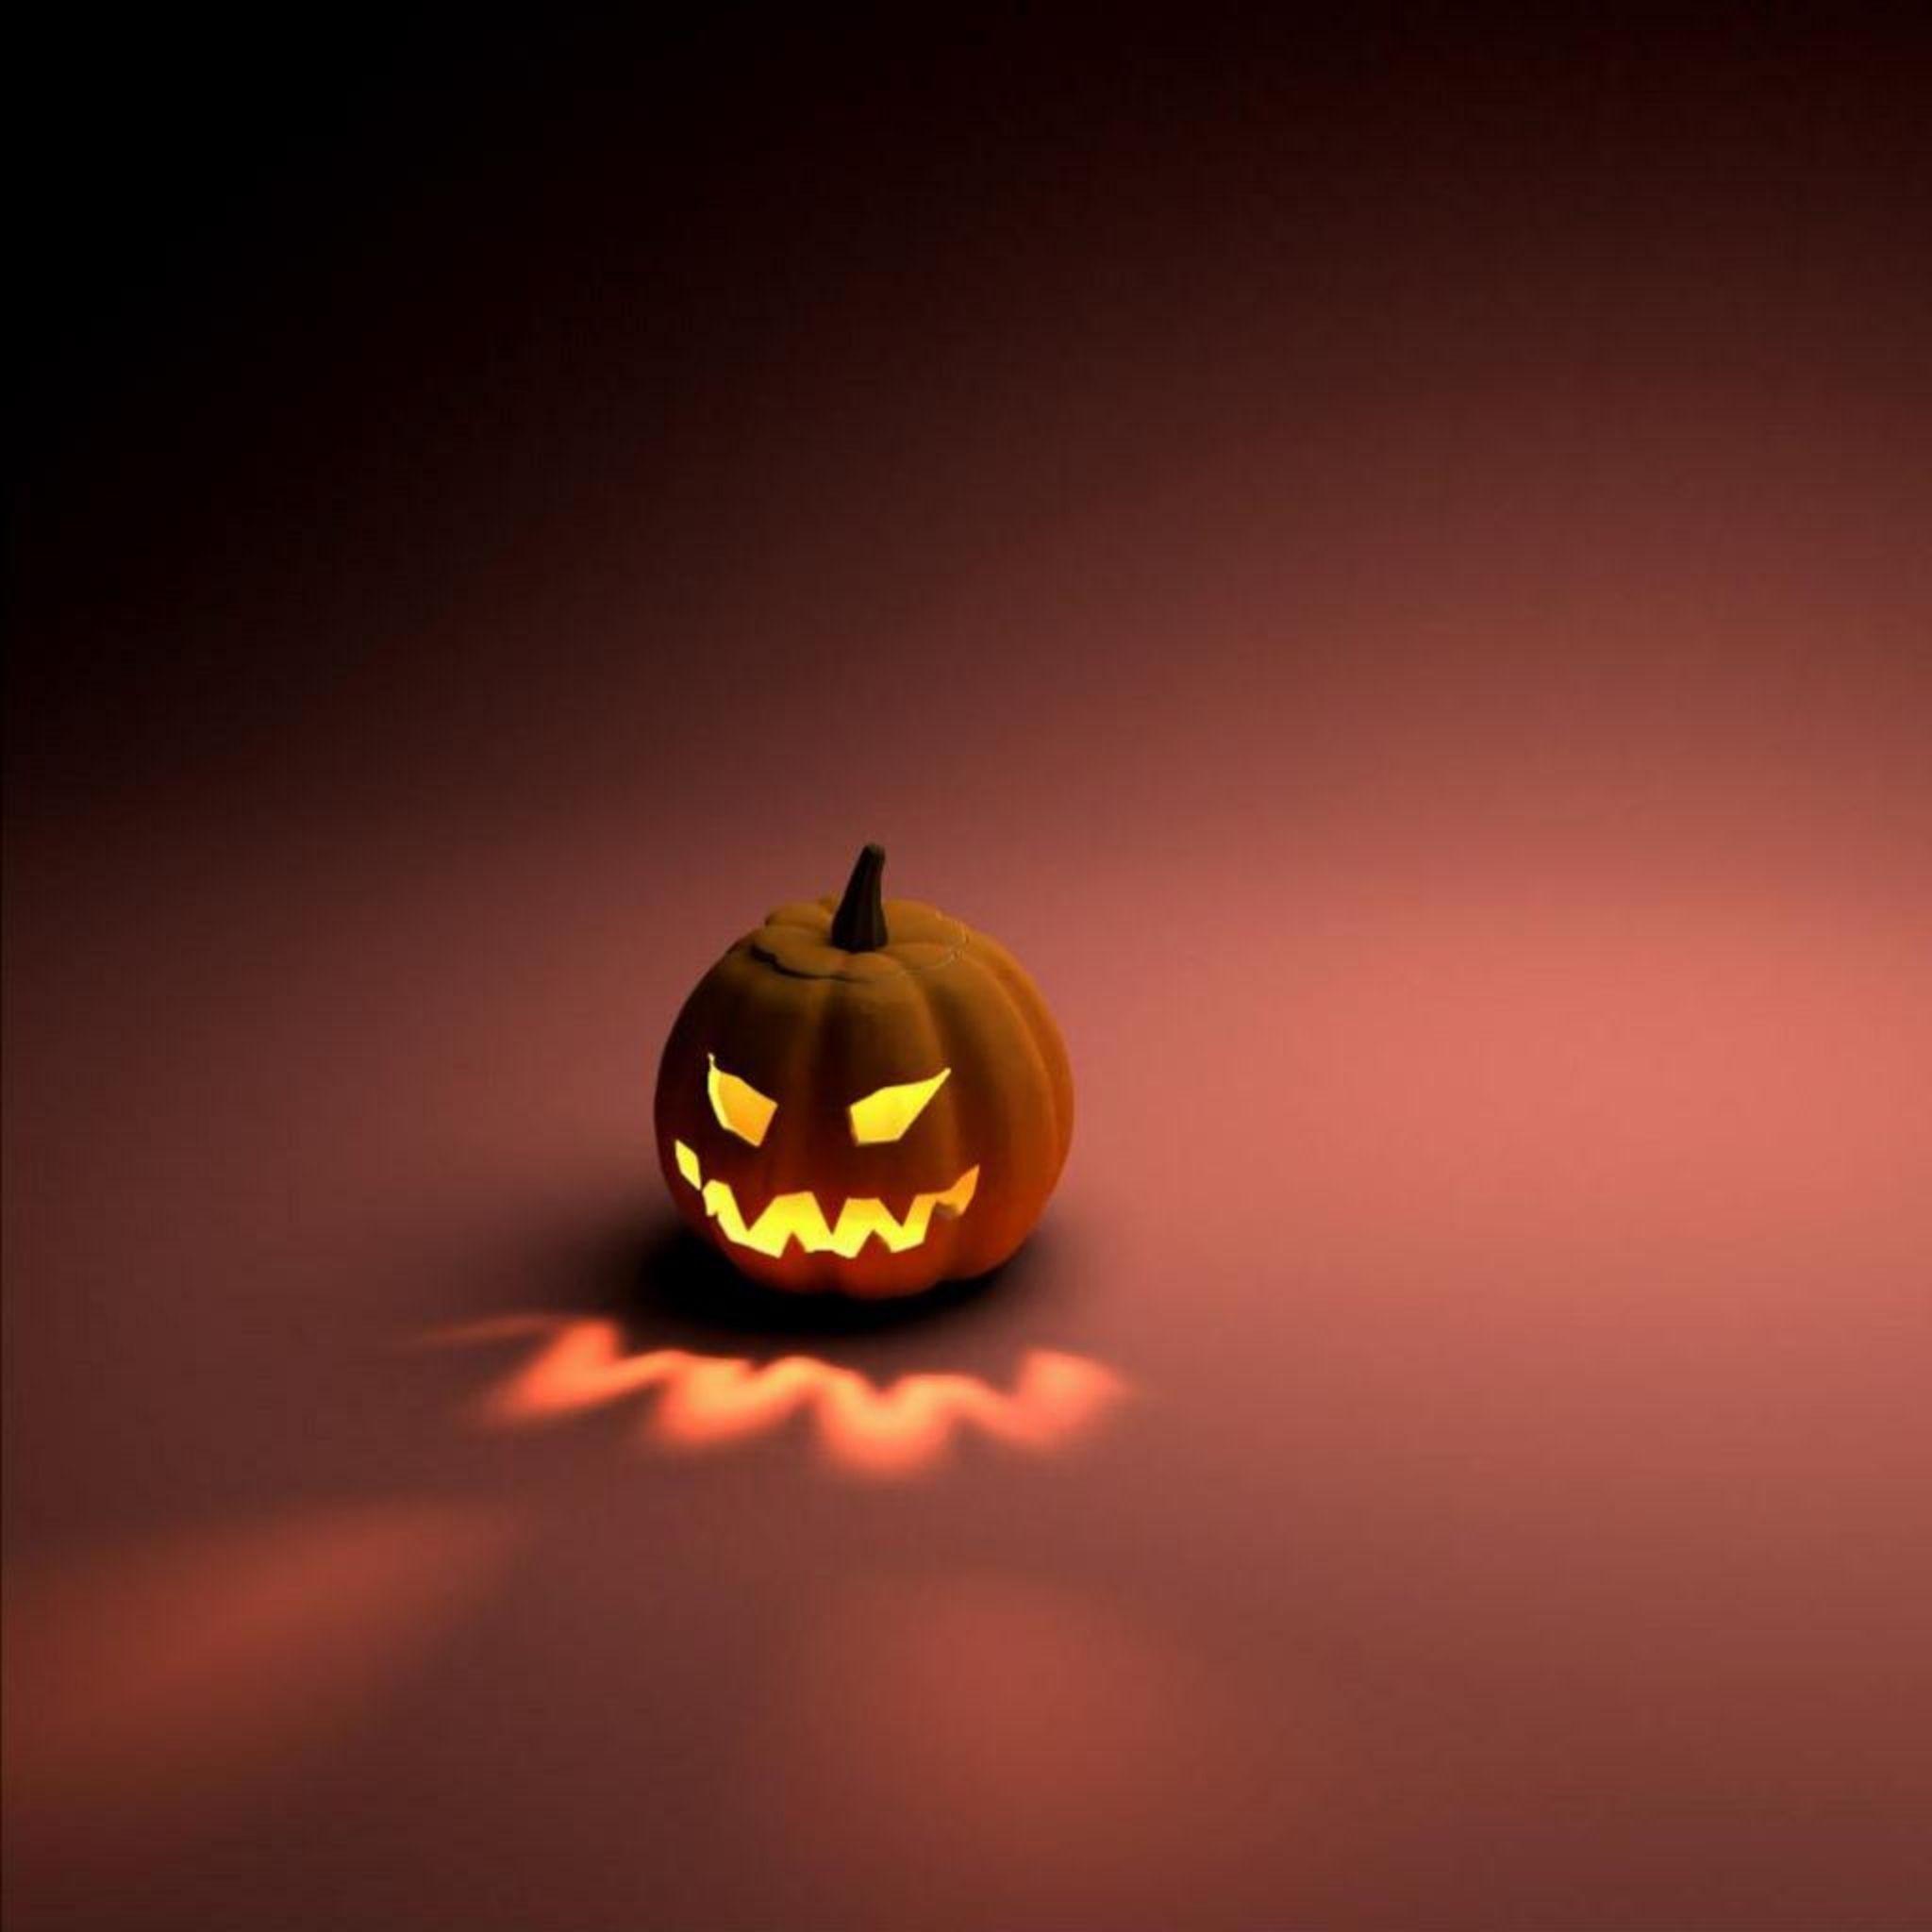 Beautiful Wallpaper Halloween Ipad Mini - 053e83ecfddc0af2555a7a97581cc262  Perfect Image Reference_1003150.jpg